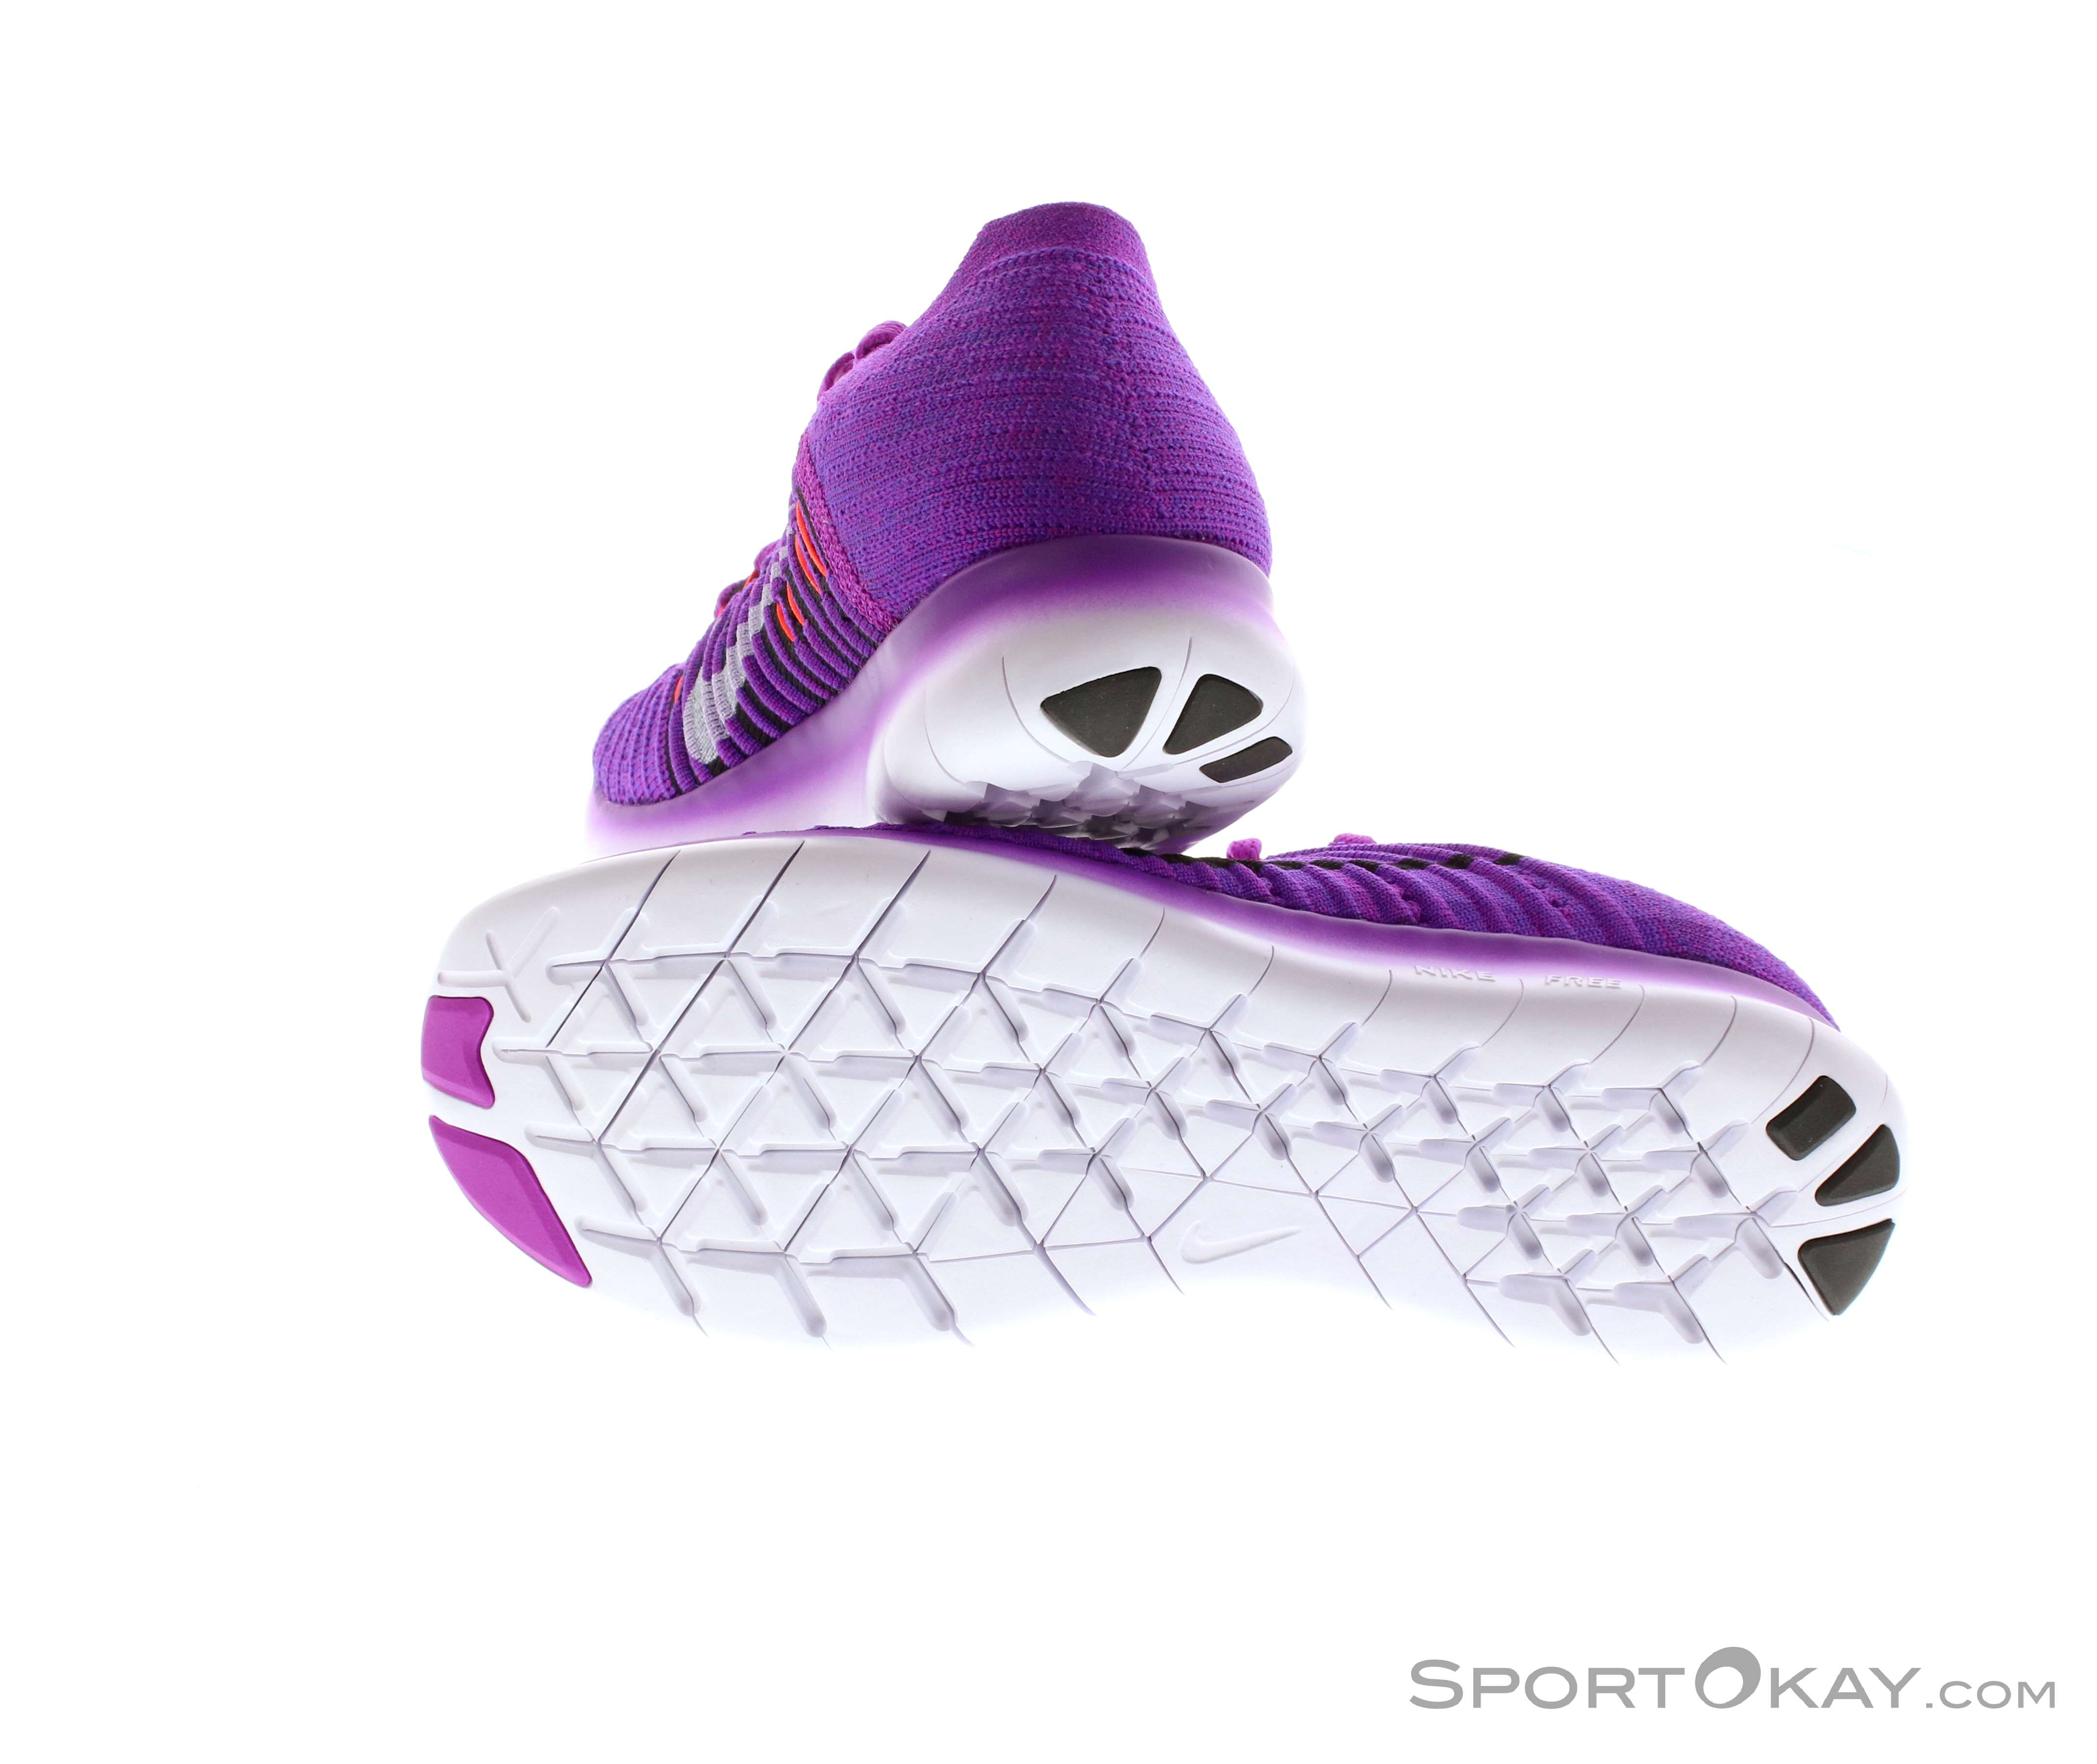 france nike free 5.0 w laufschuhe damänner rosa violett